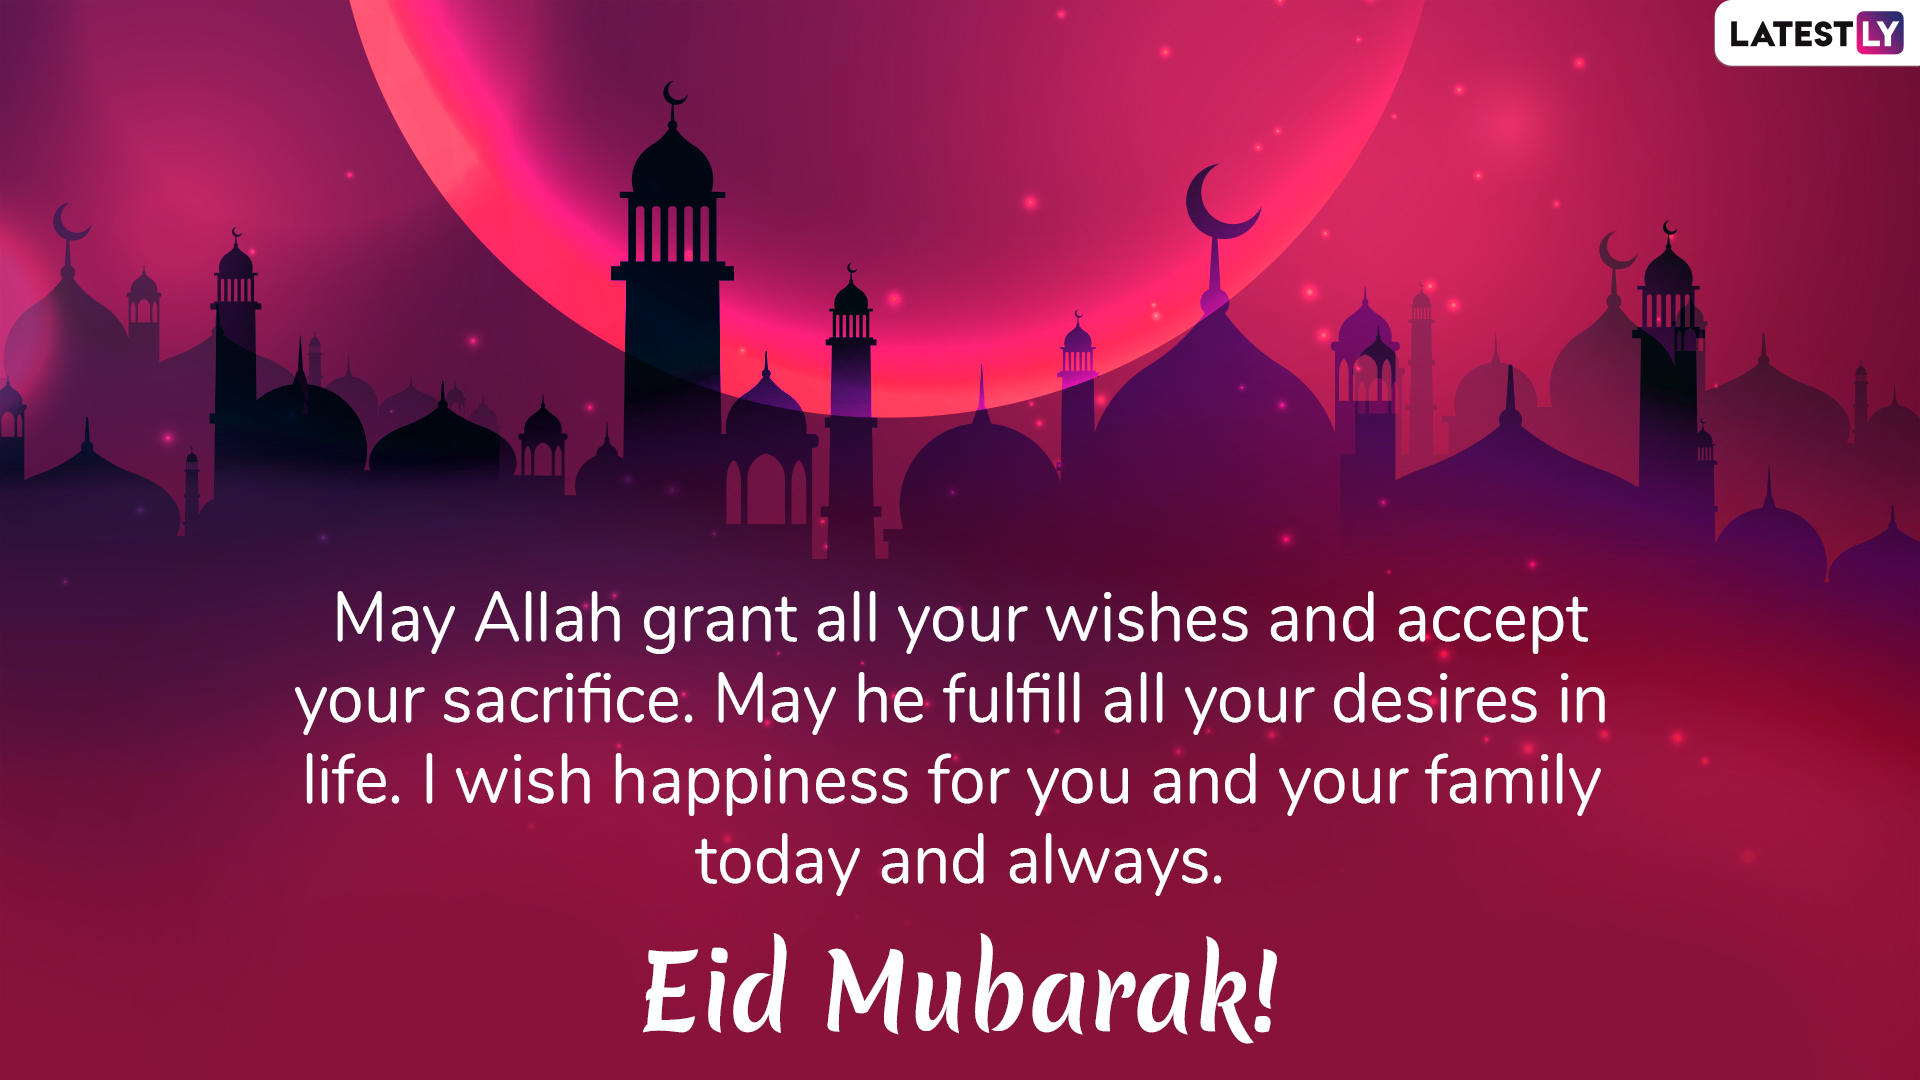 Eid ul-Adha Mubarak 2019 Messages and Images: WhatsApp ...